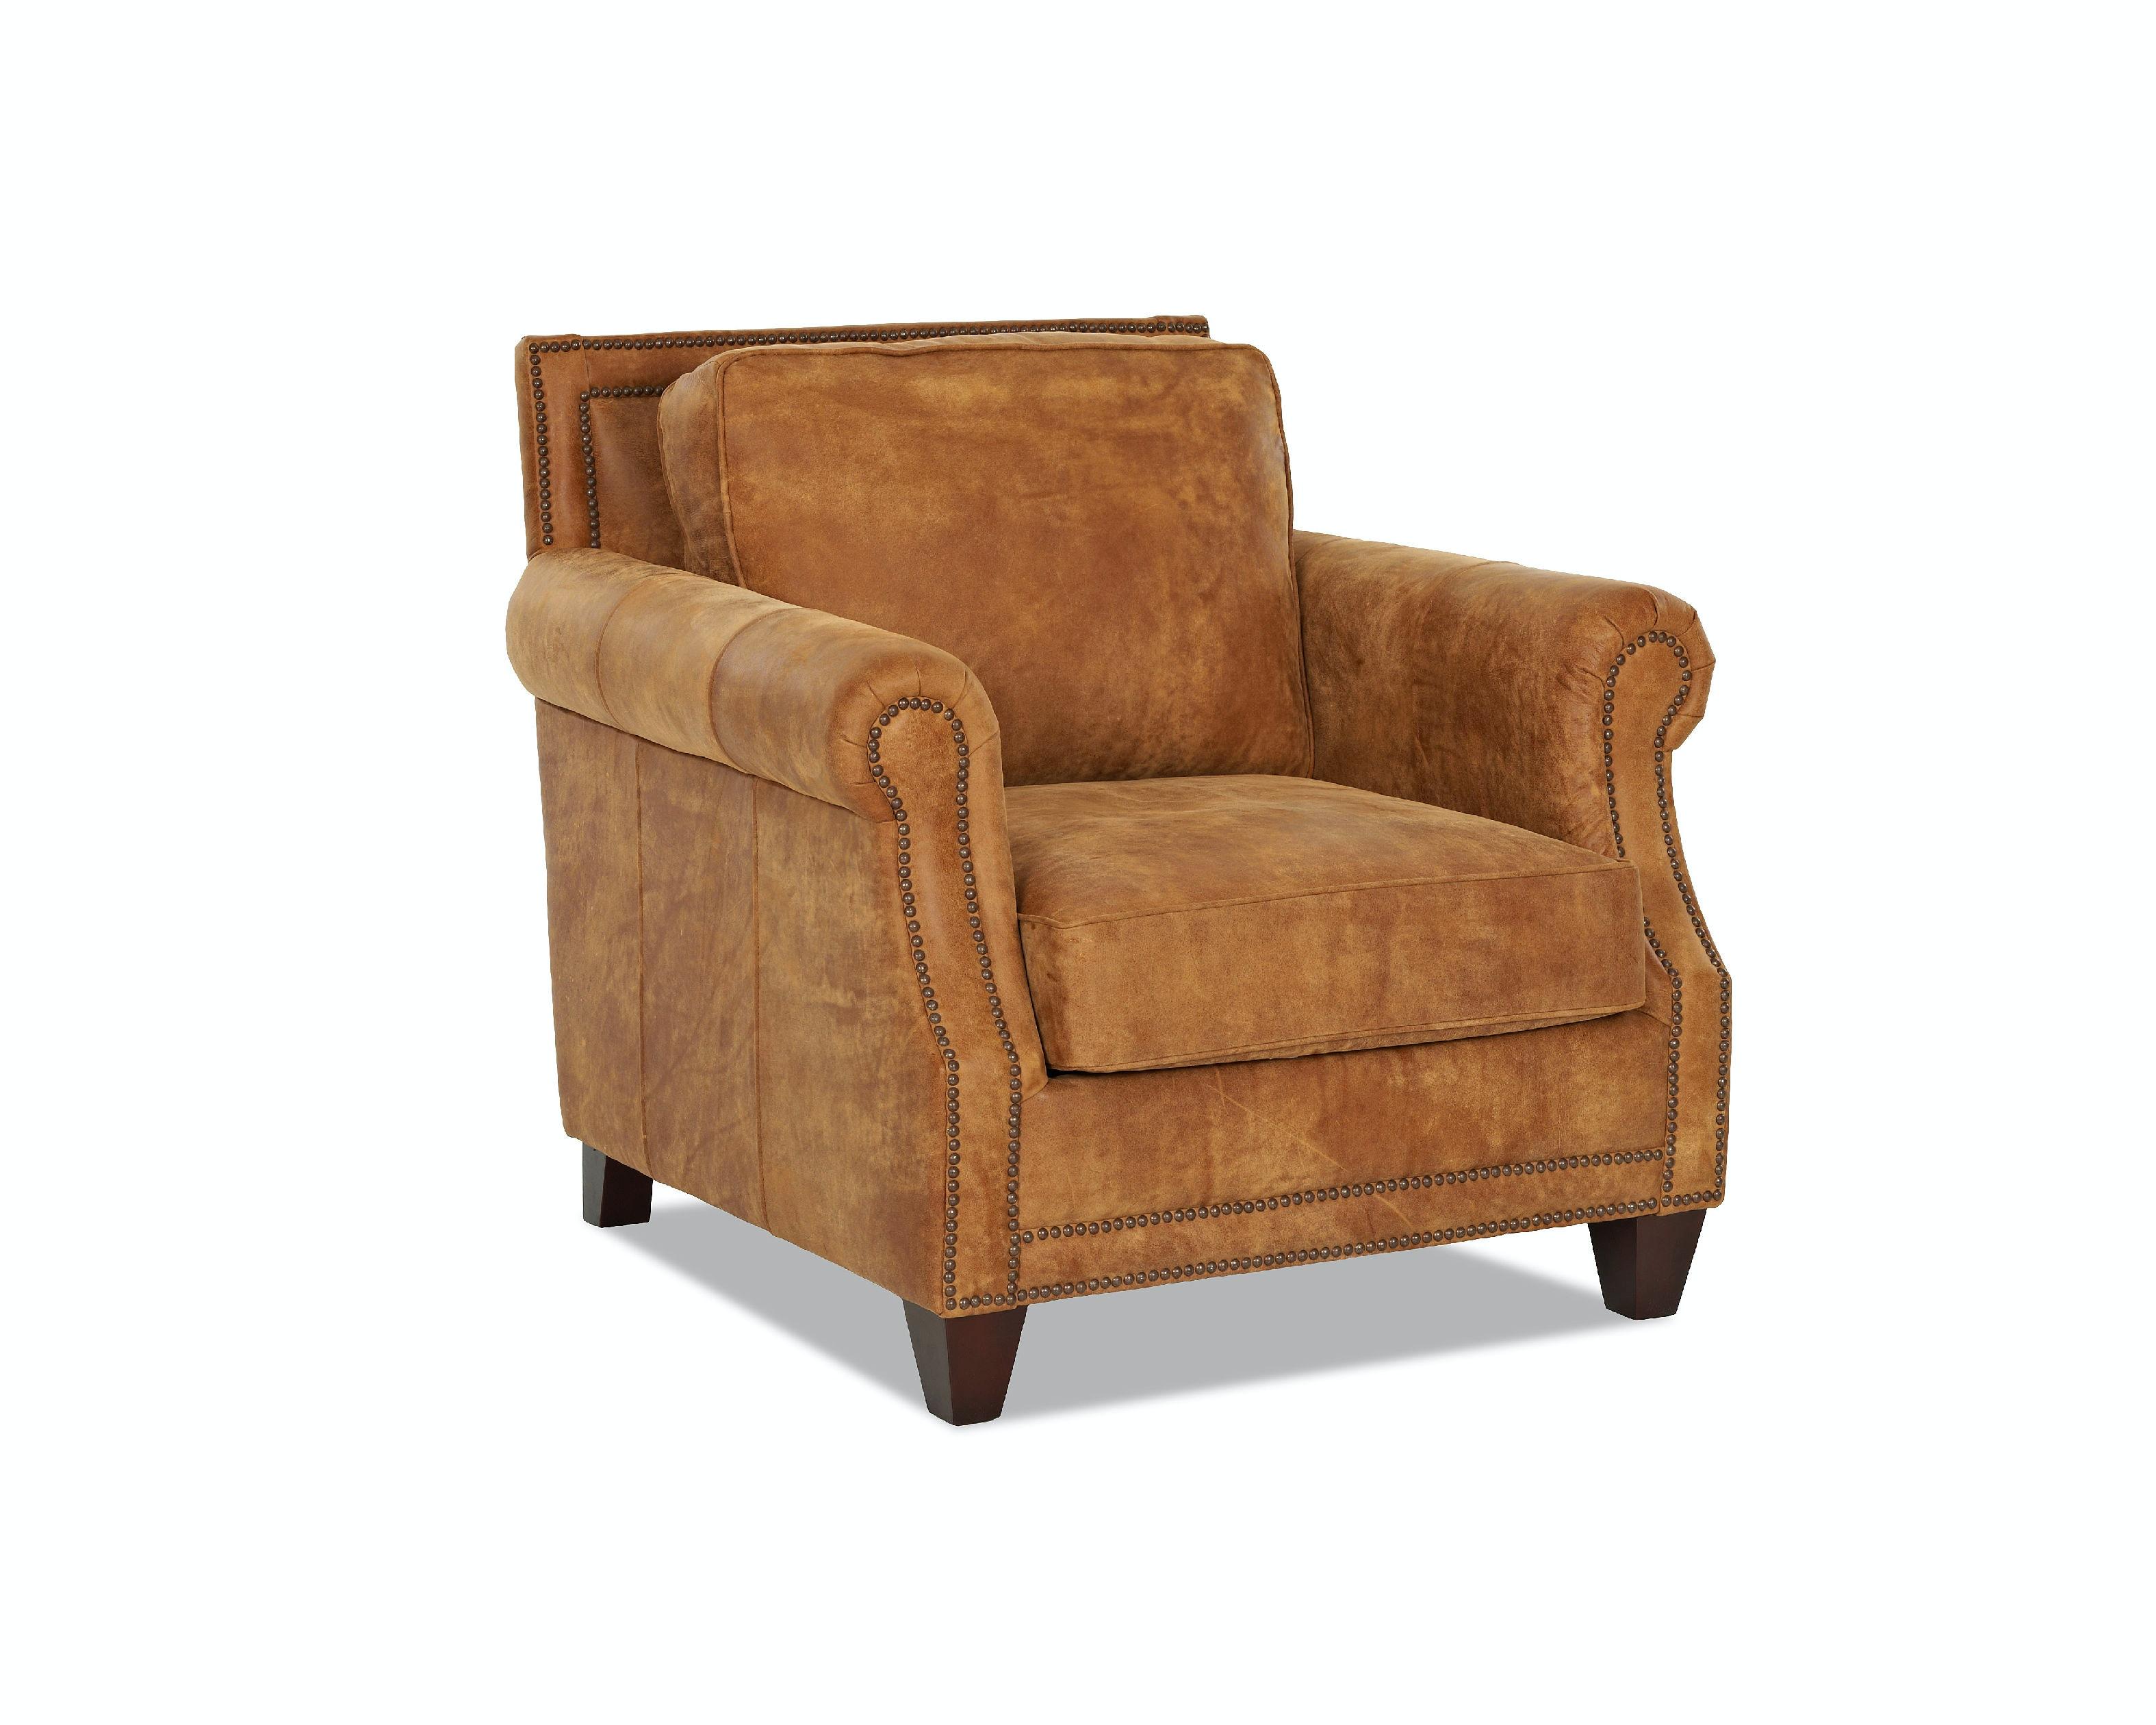 klaussner living room york chair ld58710 c goldsteins furniture bedding hermitage pa. Black Bedroom Furniture Sets. Home Design Ideas